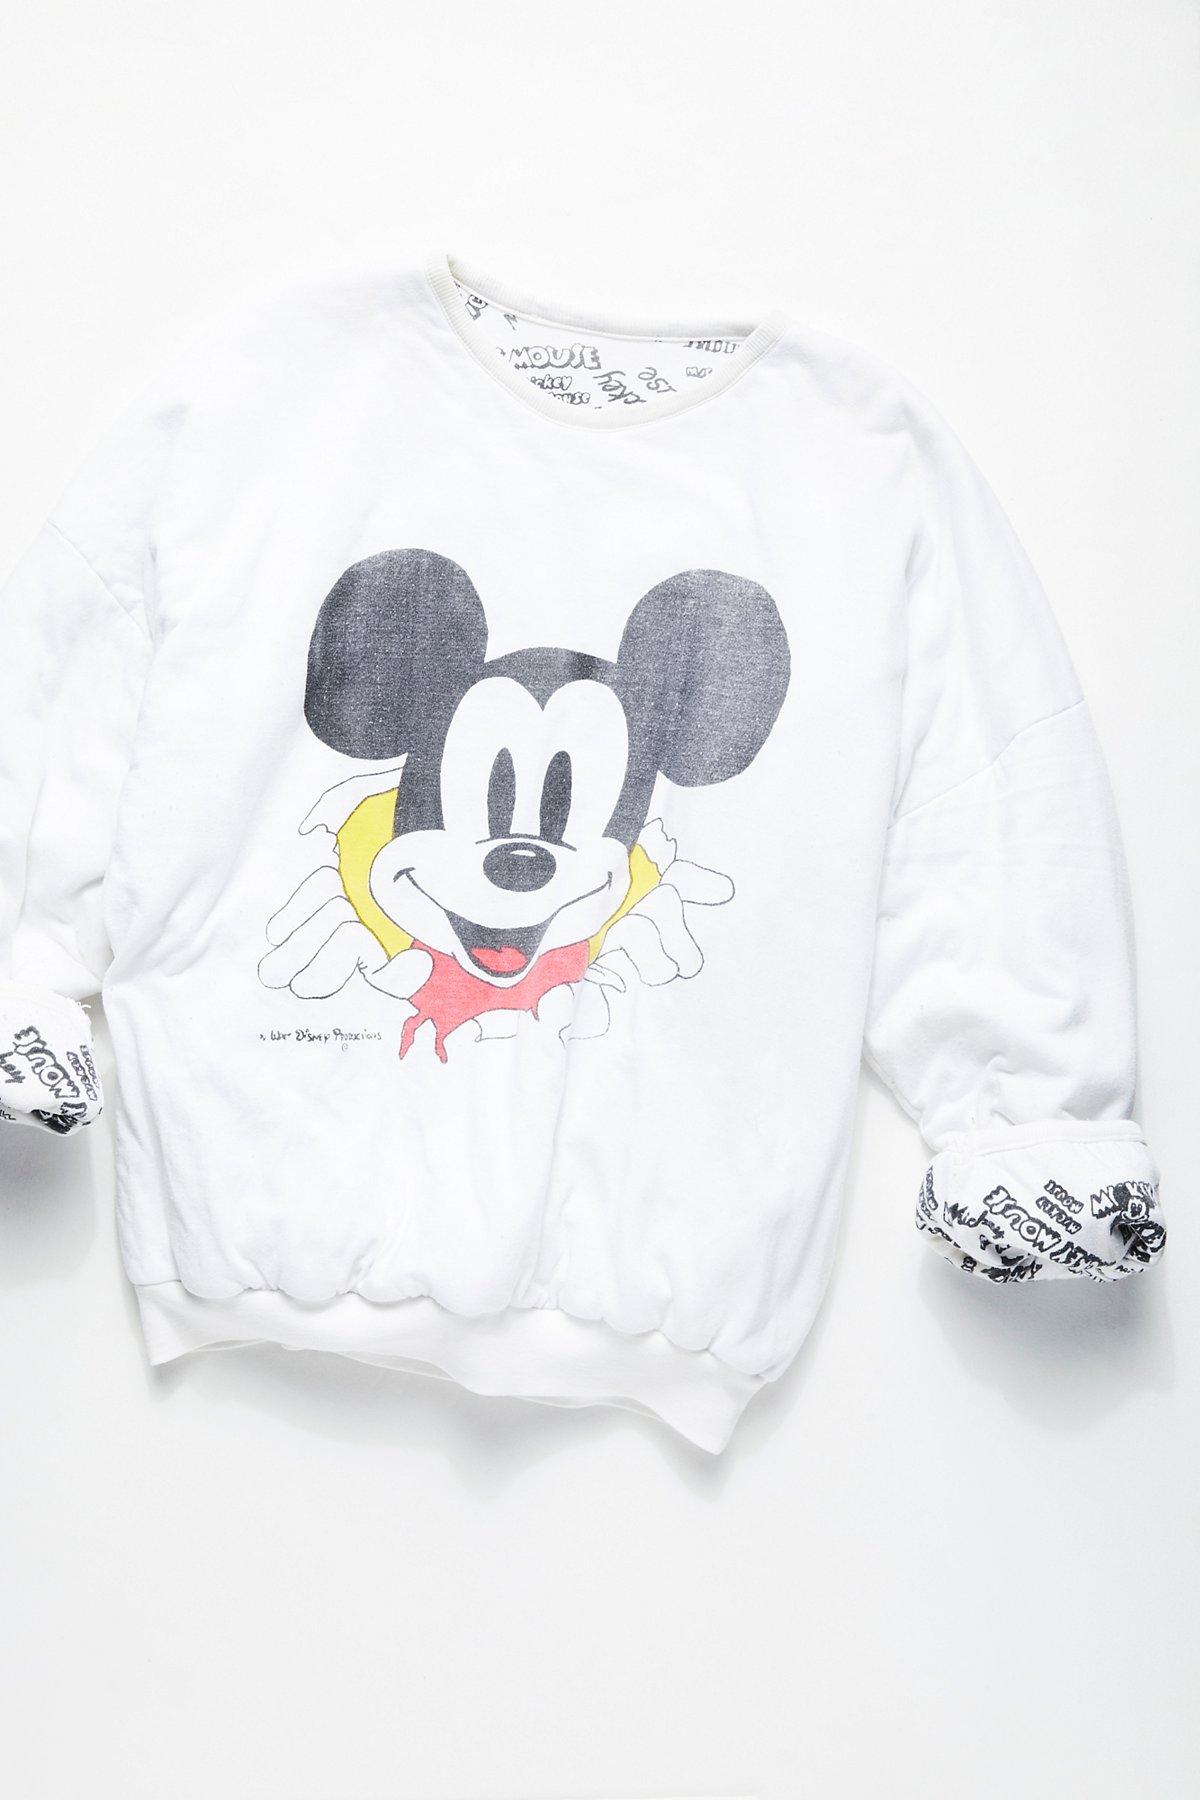 Vintage 1980s Mickey Mouse Sweatshirt